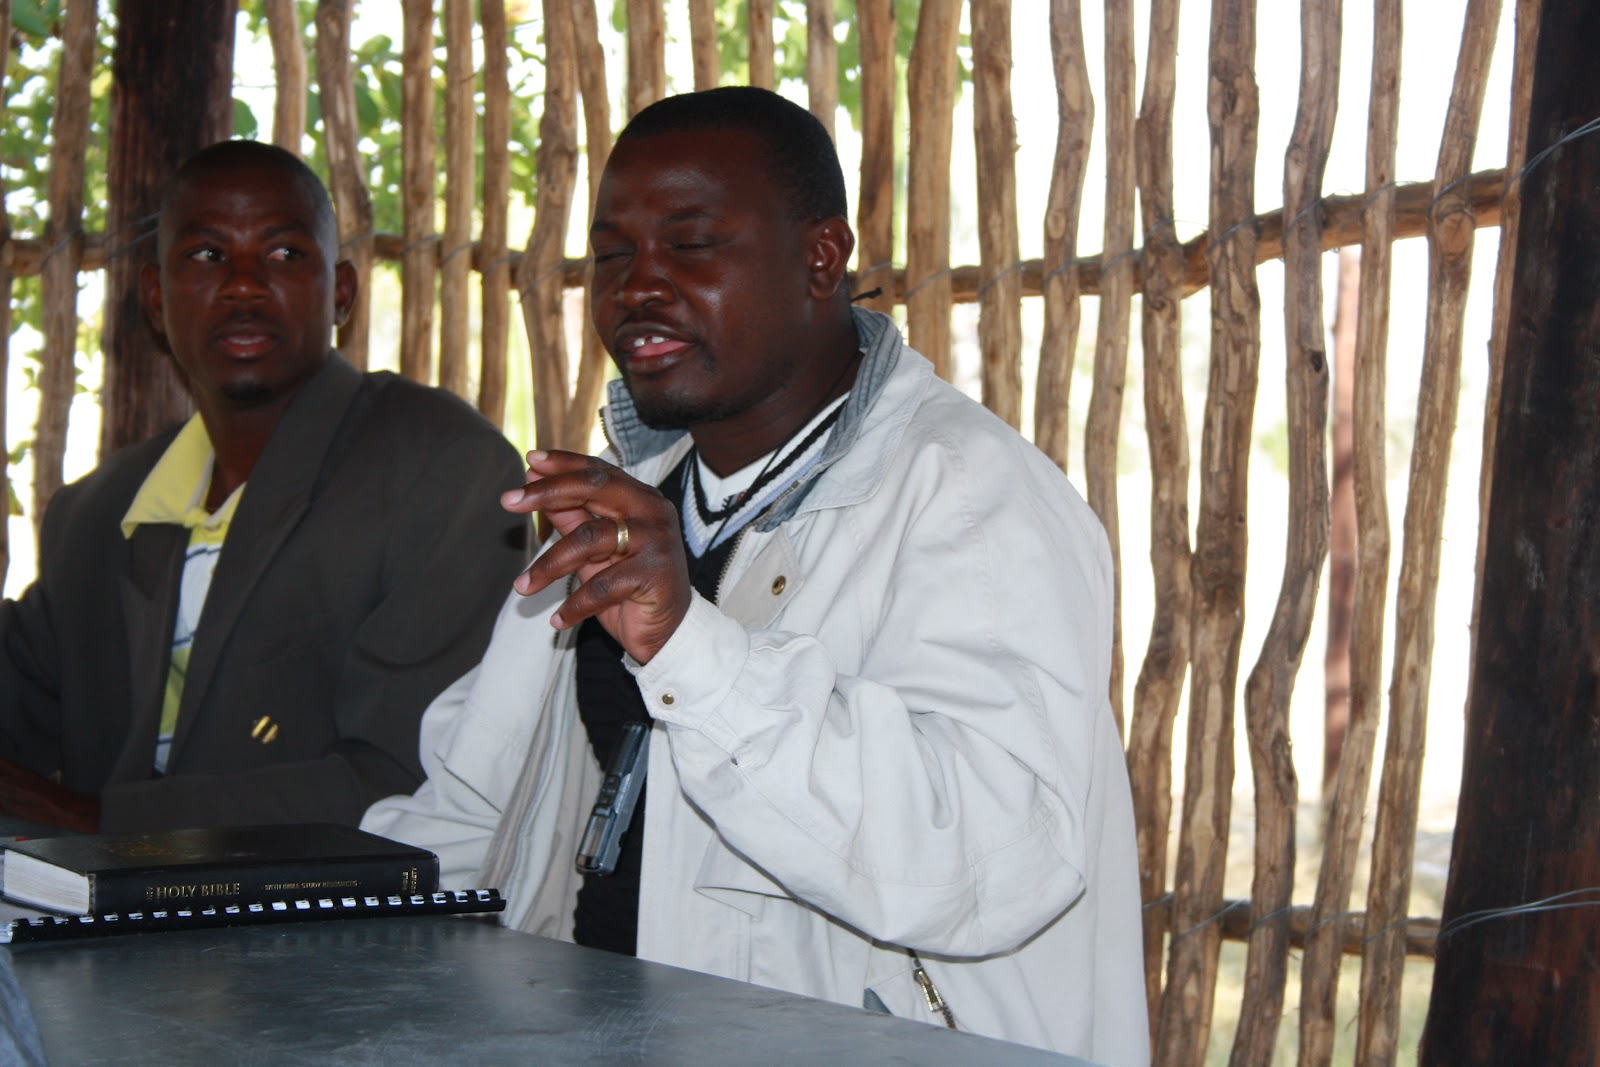 A Reformed Baptist in Namibia: NAMIBIA PASTORS CONFERENCE: Olukonda